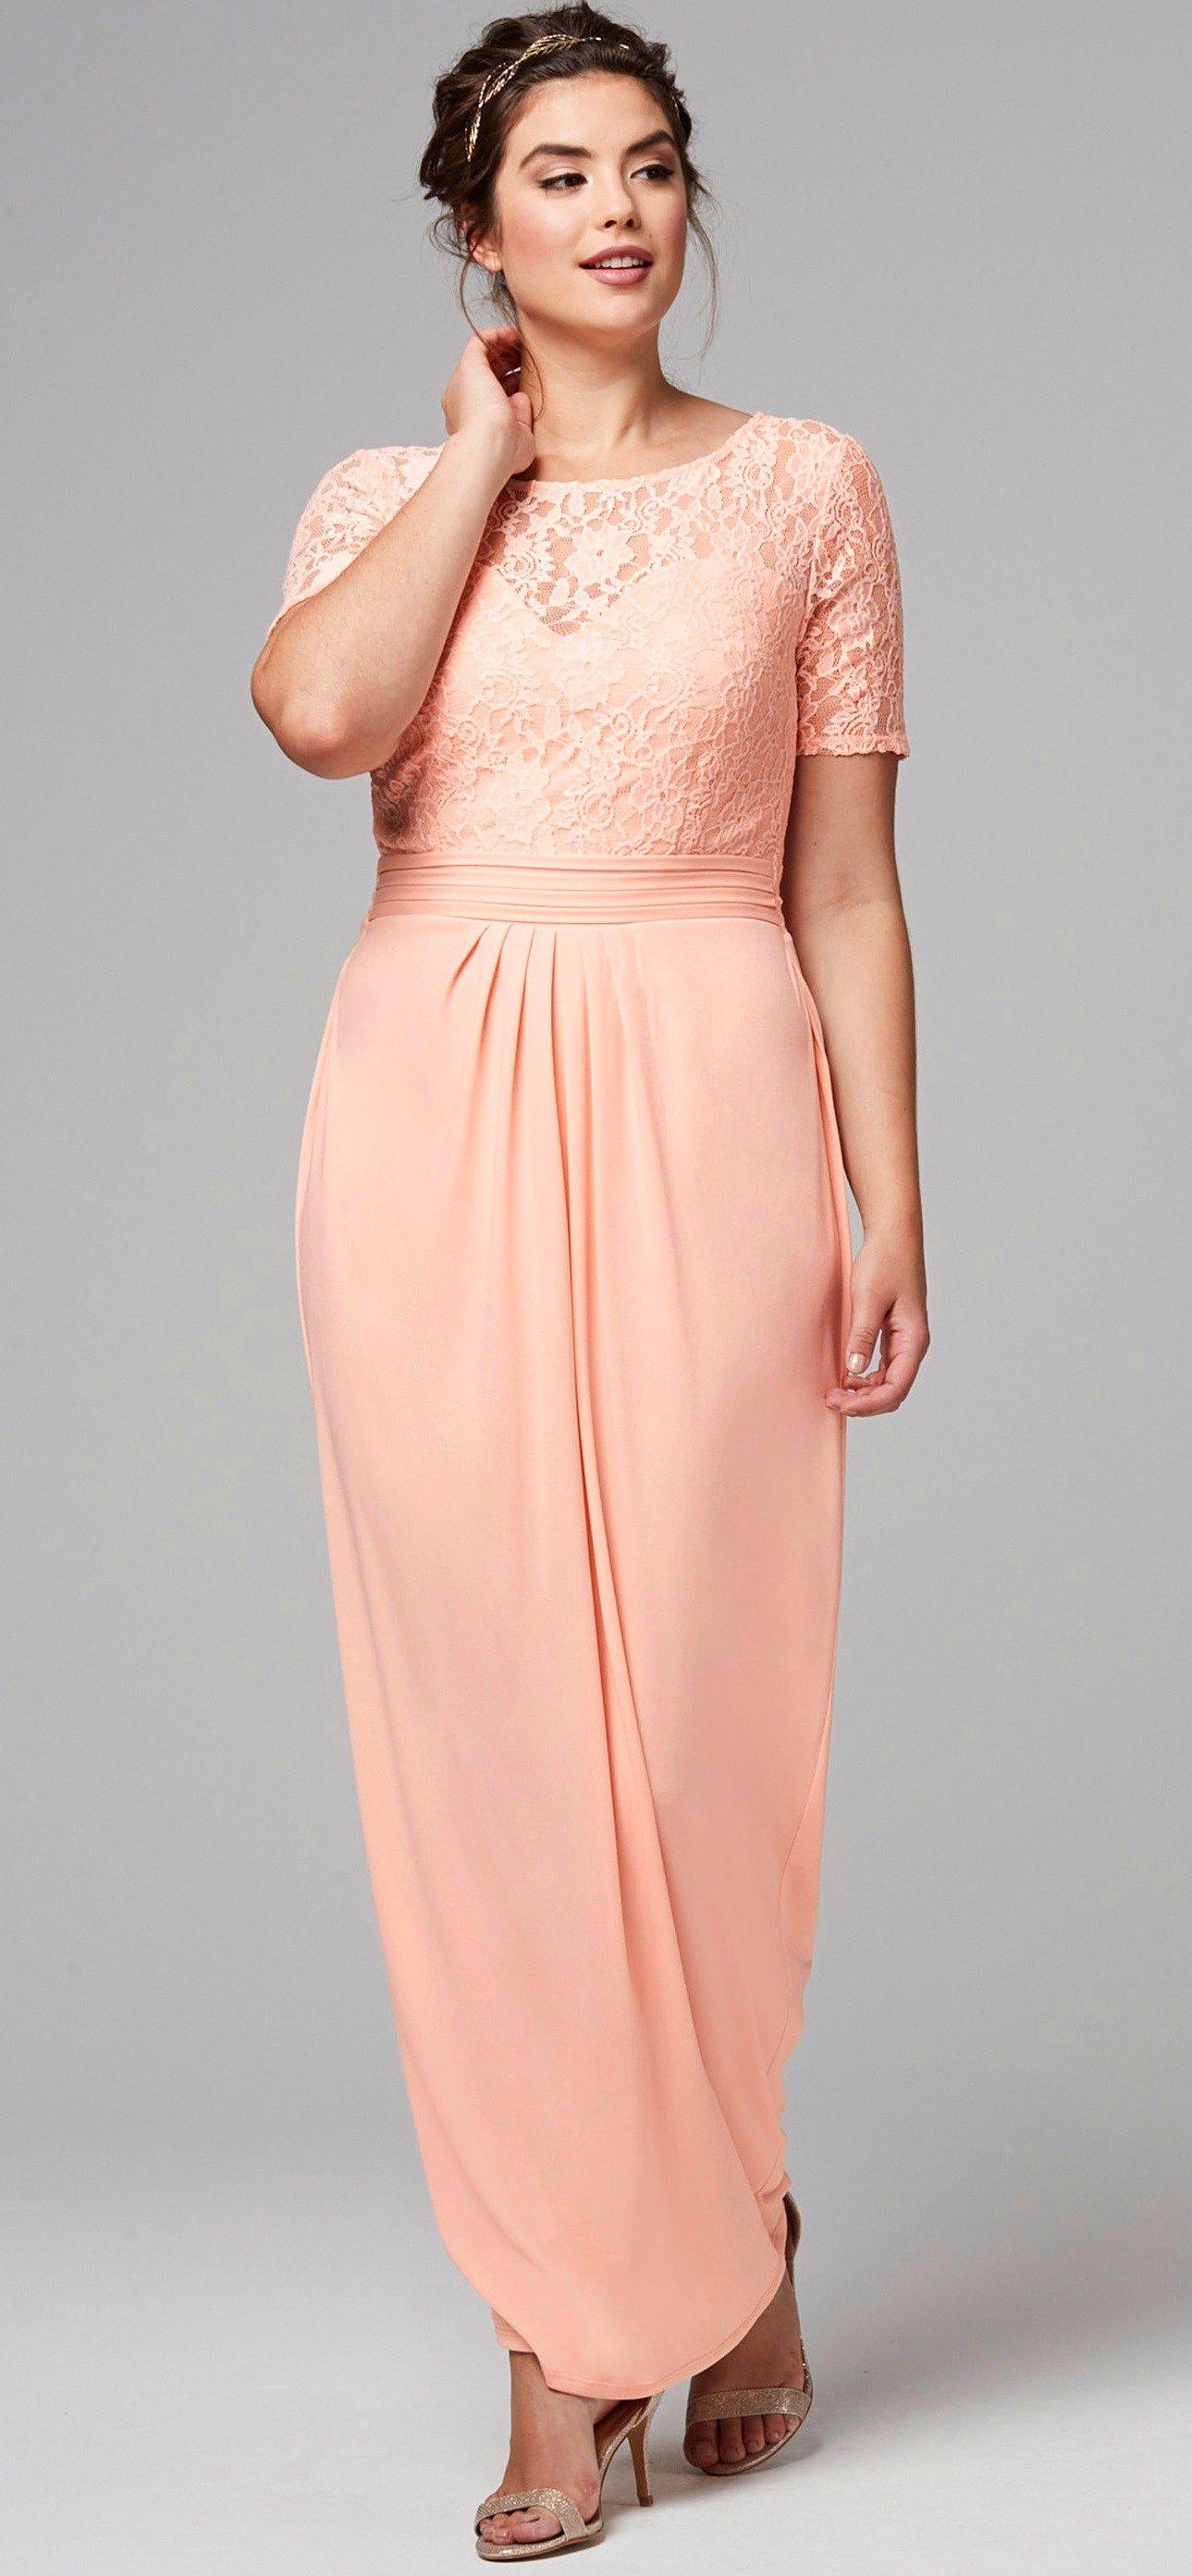 Peach dress for wedding guest  Plus Size Lace Off Shoulder Flare Dress  Dramatic off shoulder